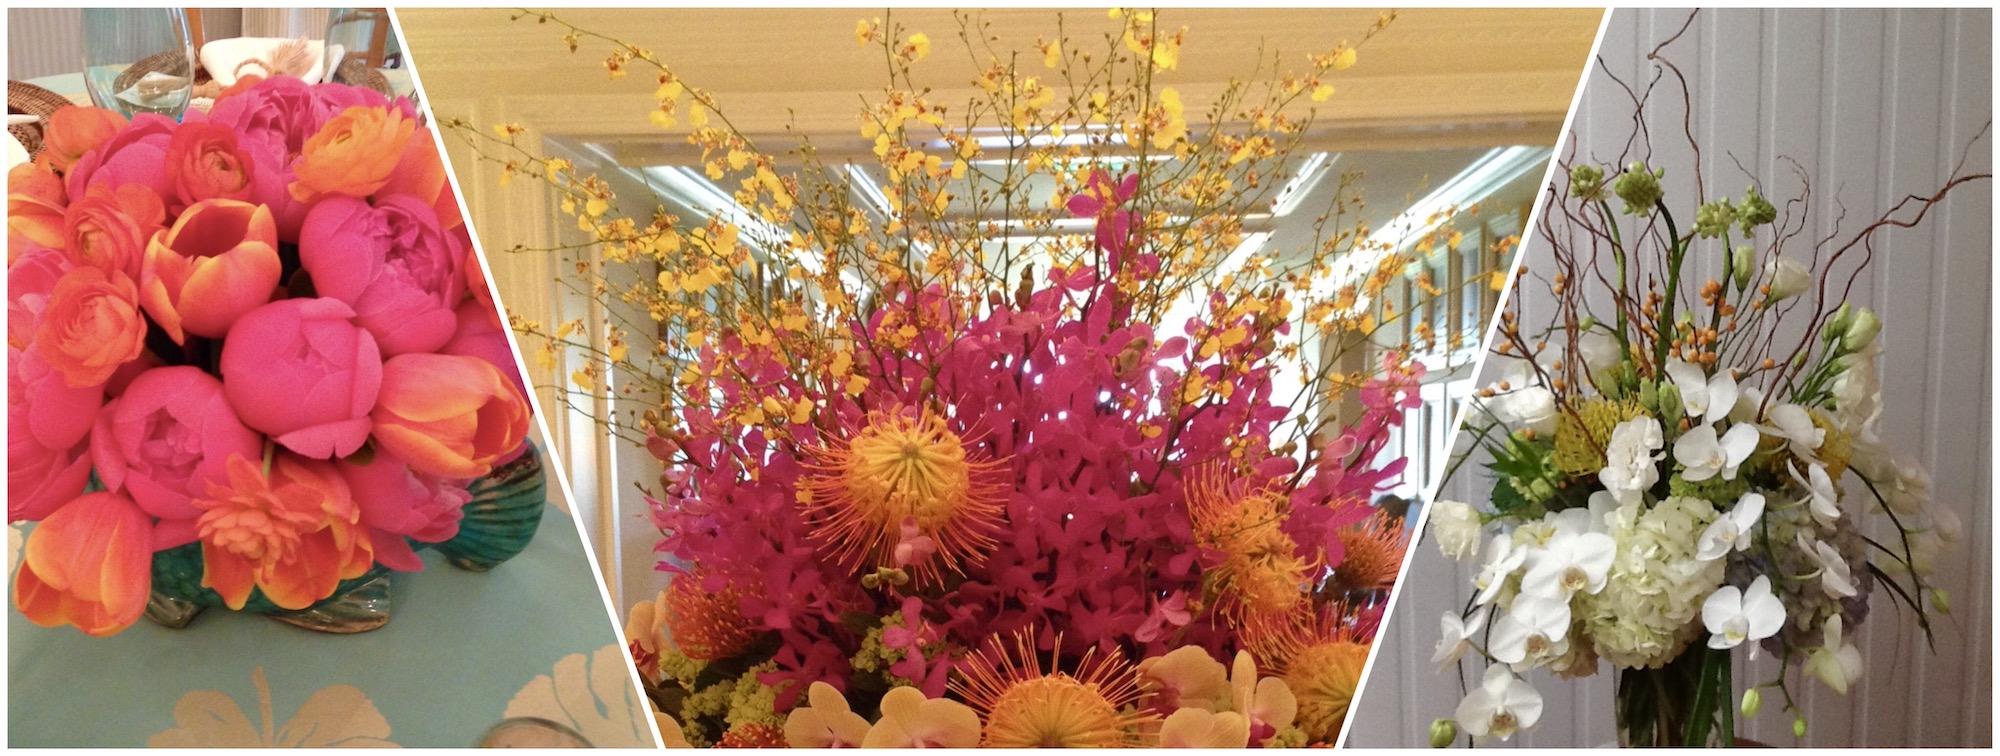 Country Club Floral & Plant Decor - Ft. Lauderdale, FL Velene's Floral